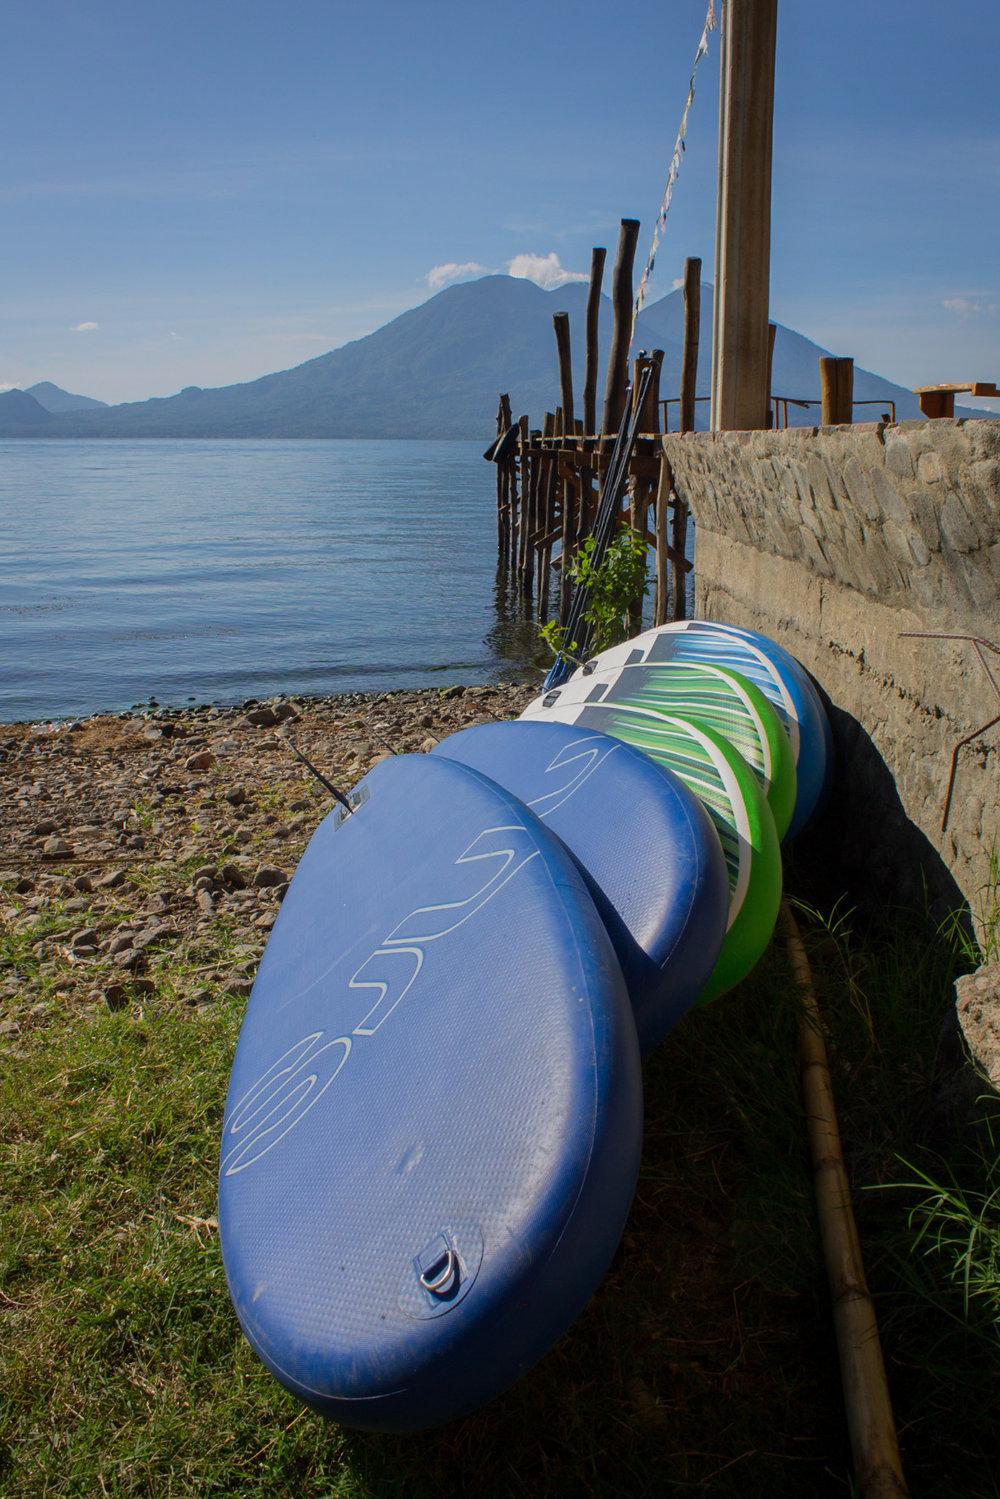 Bambu Guest House, Retreat Center, Hotel, sustainable, regenerative living, ecotourism, activities, small groups, Tzununa, Lake Atitlan, Guatemala, group travel, retreat, retreats, 2019